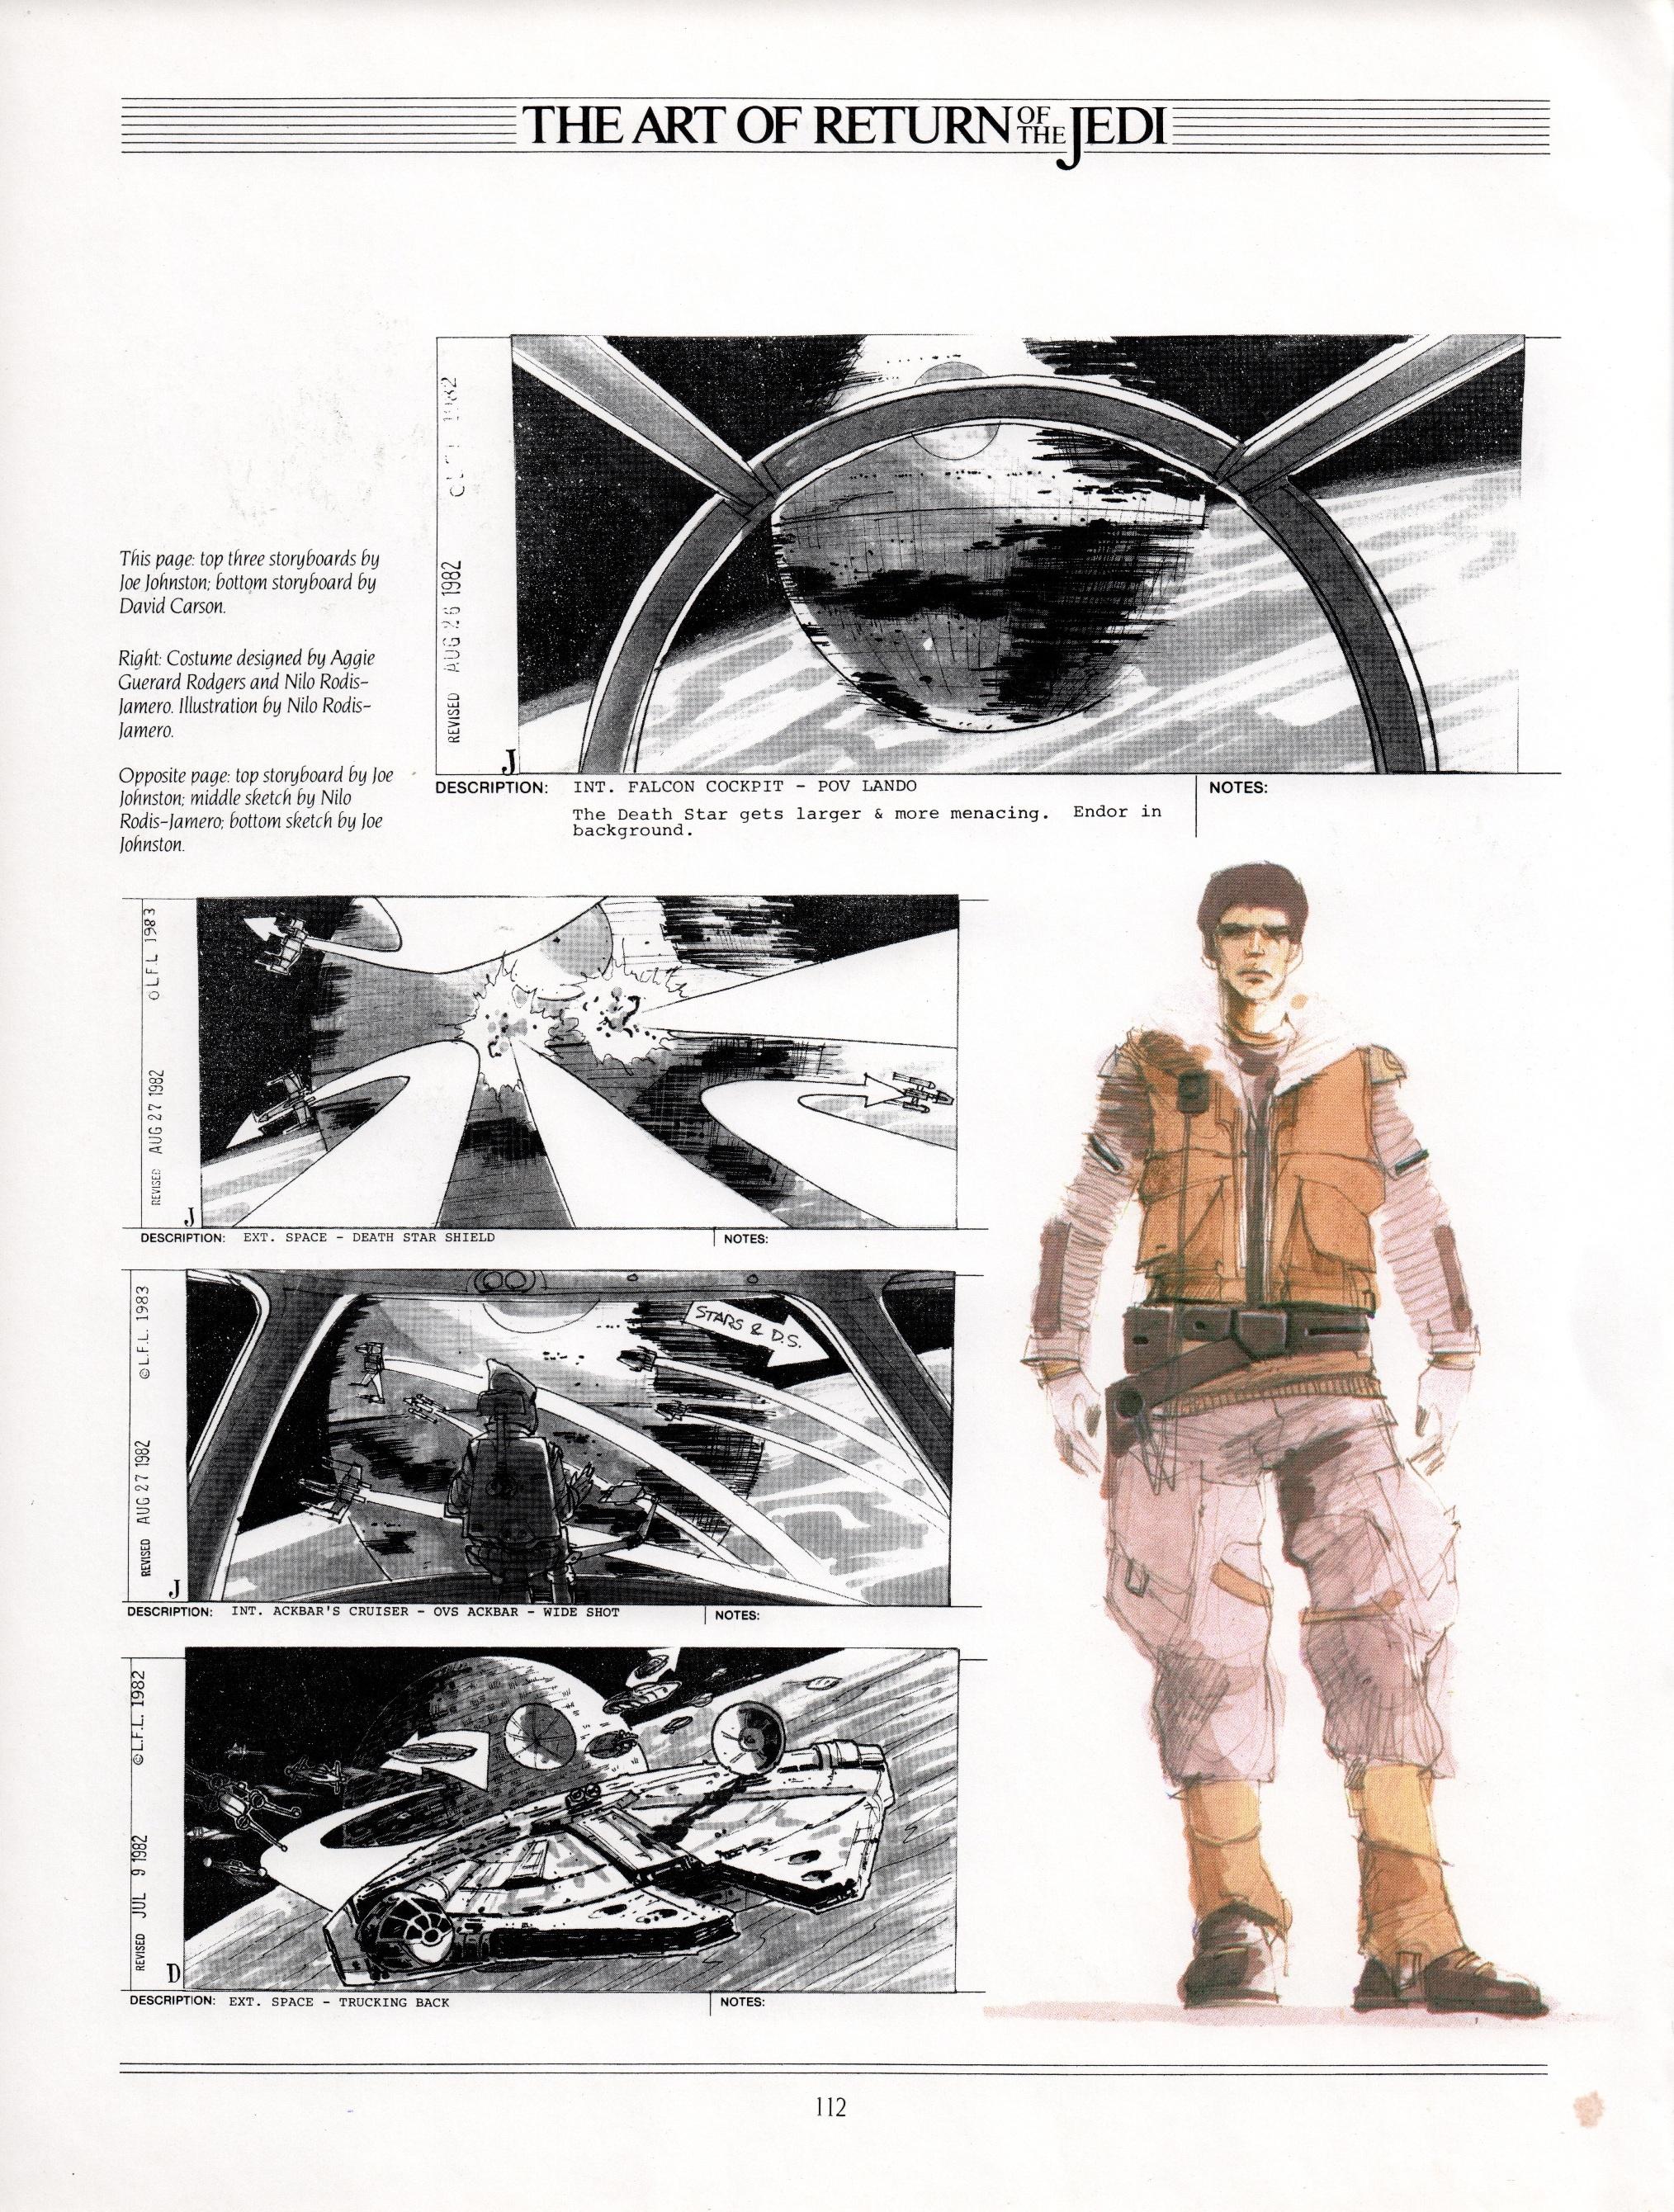 Art of Return of the Jedi (b0bafett_Empire)-p112